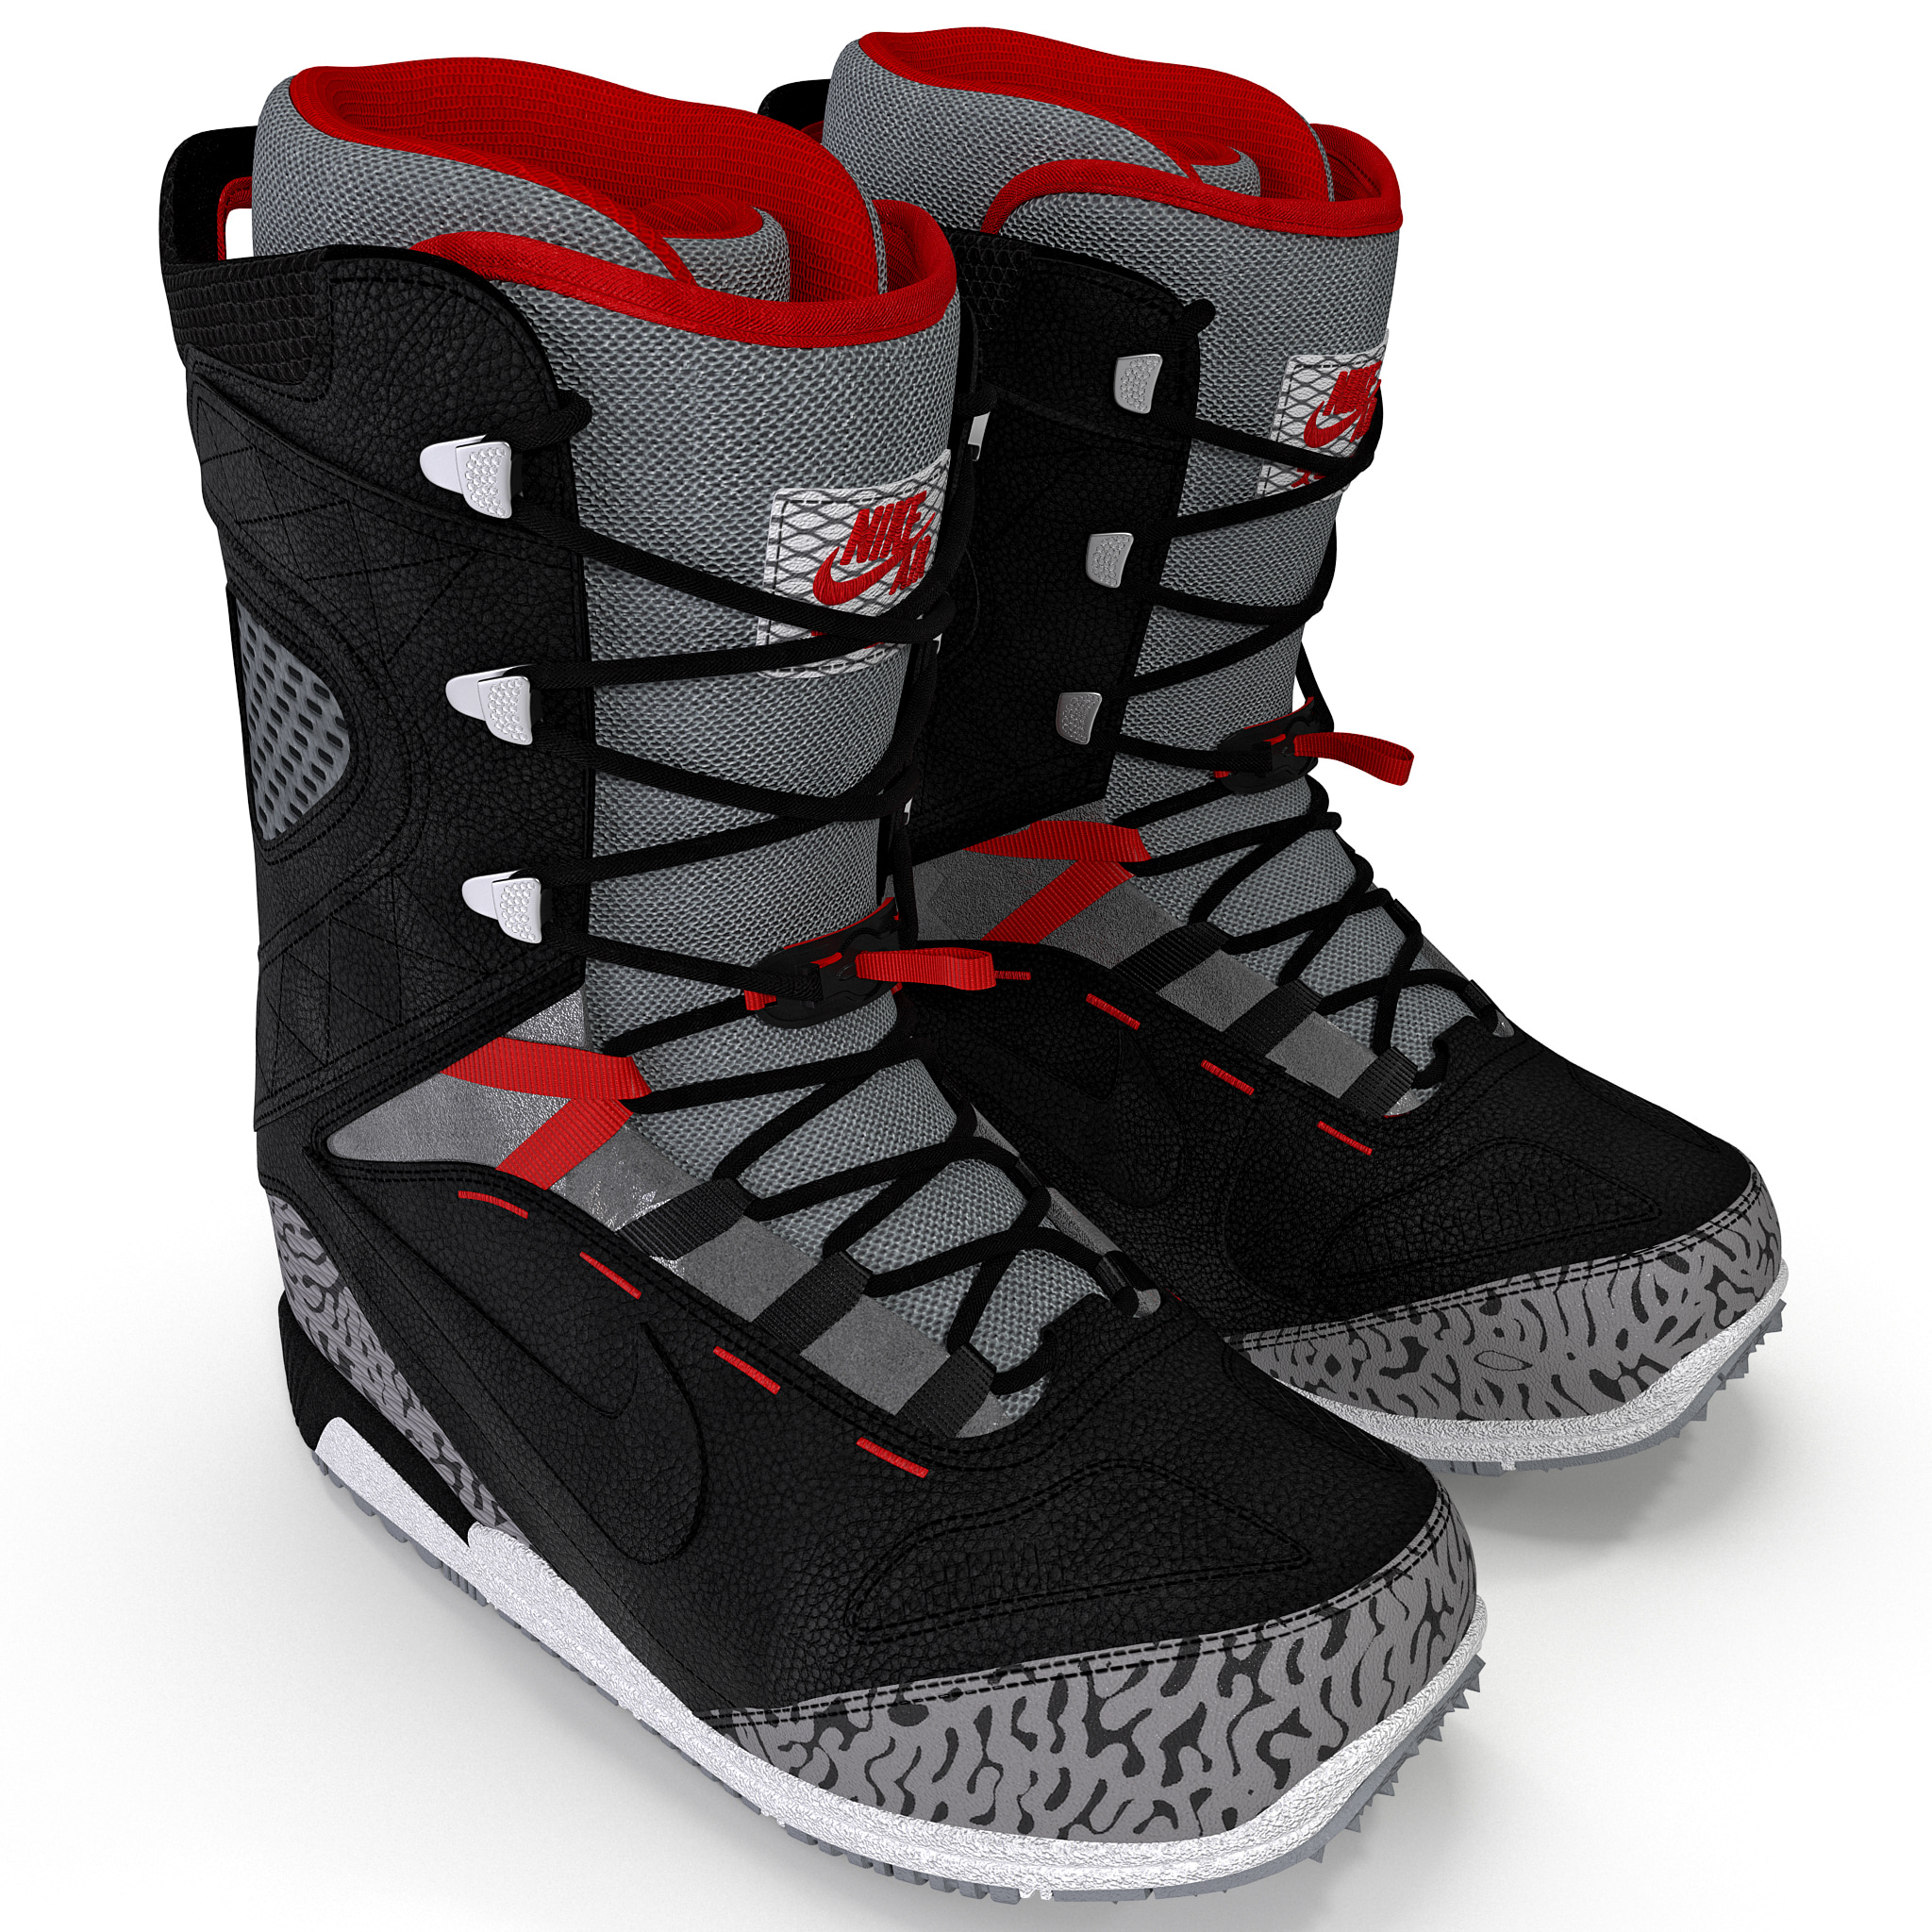 Snowboarding Boots Nike Zoom Kaiju_167.jpg